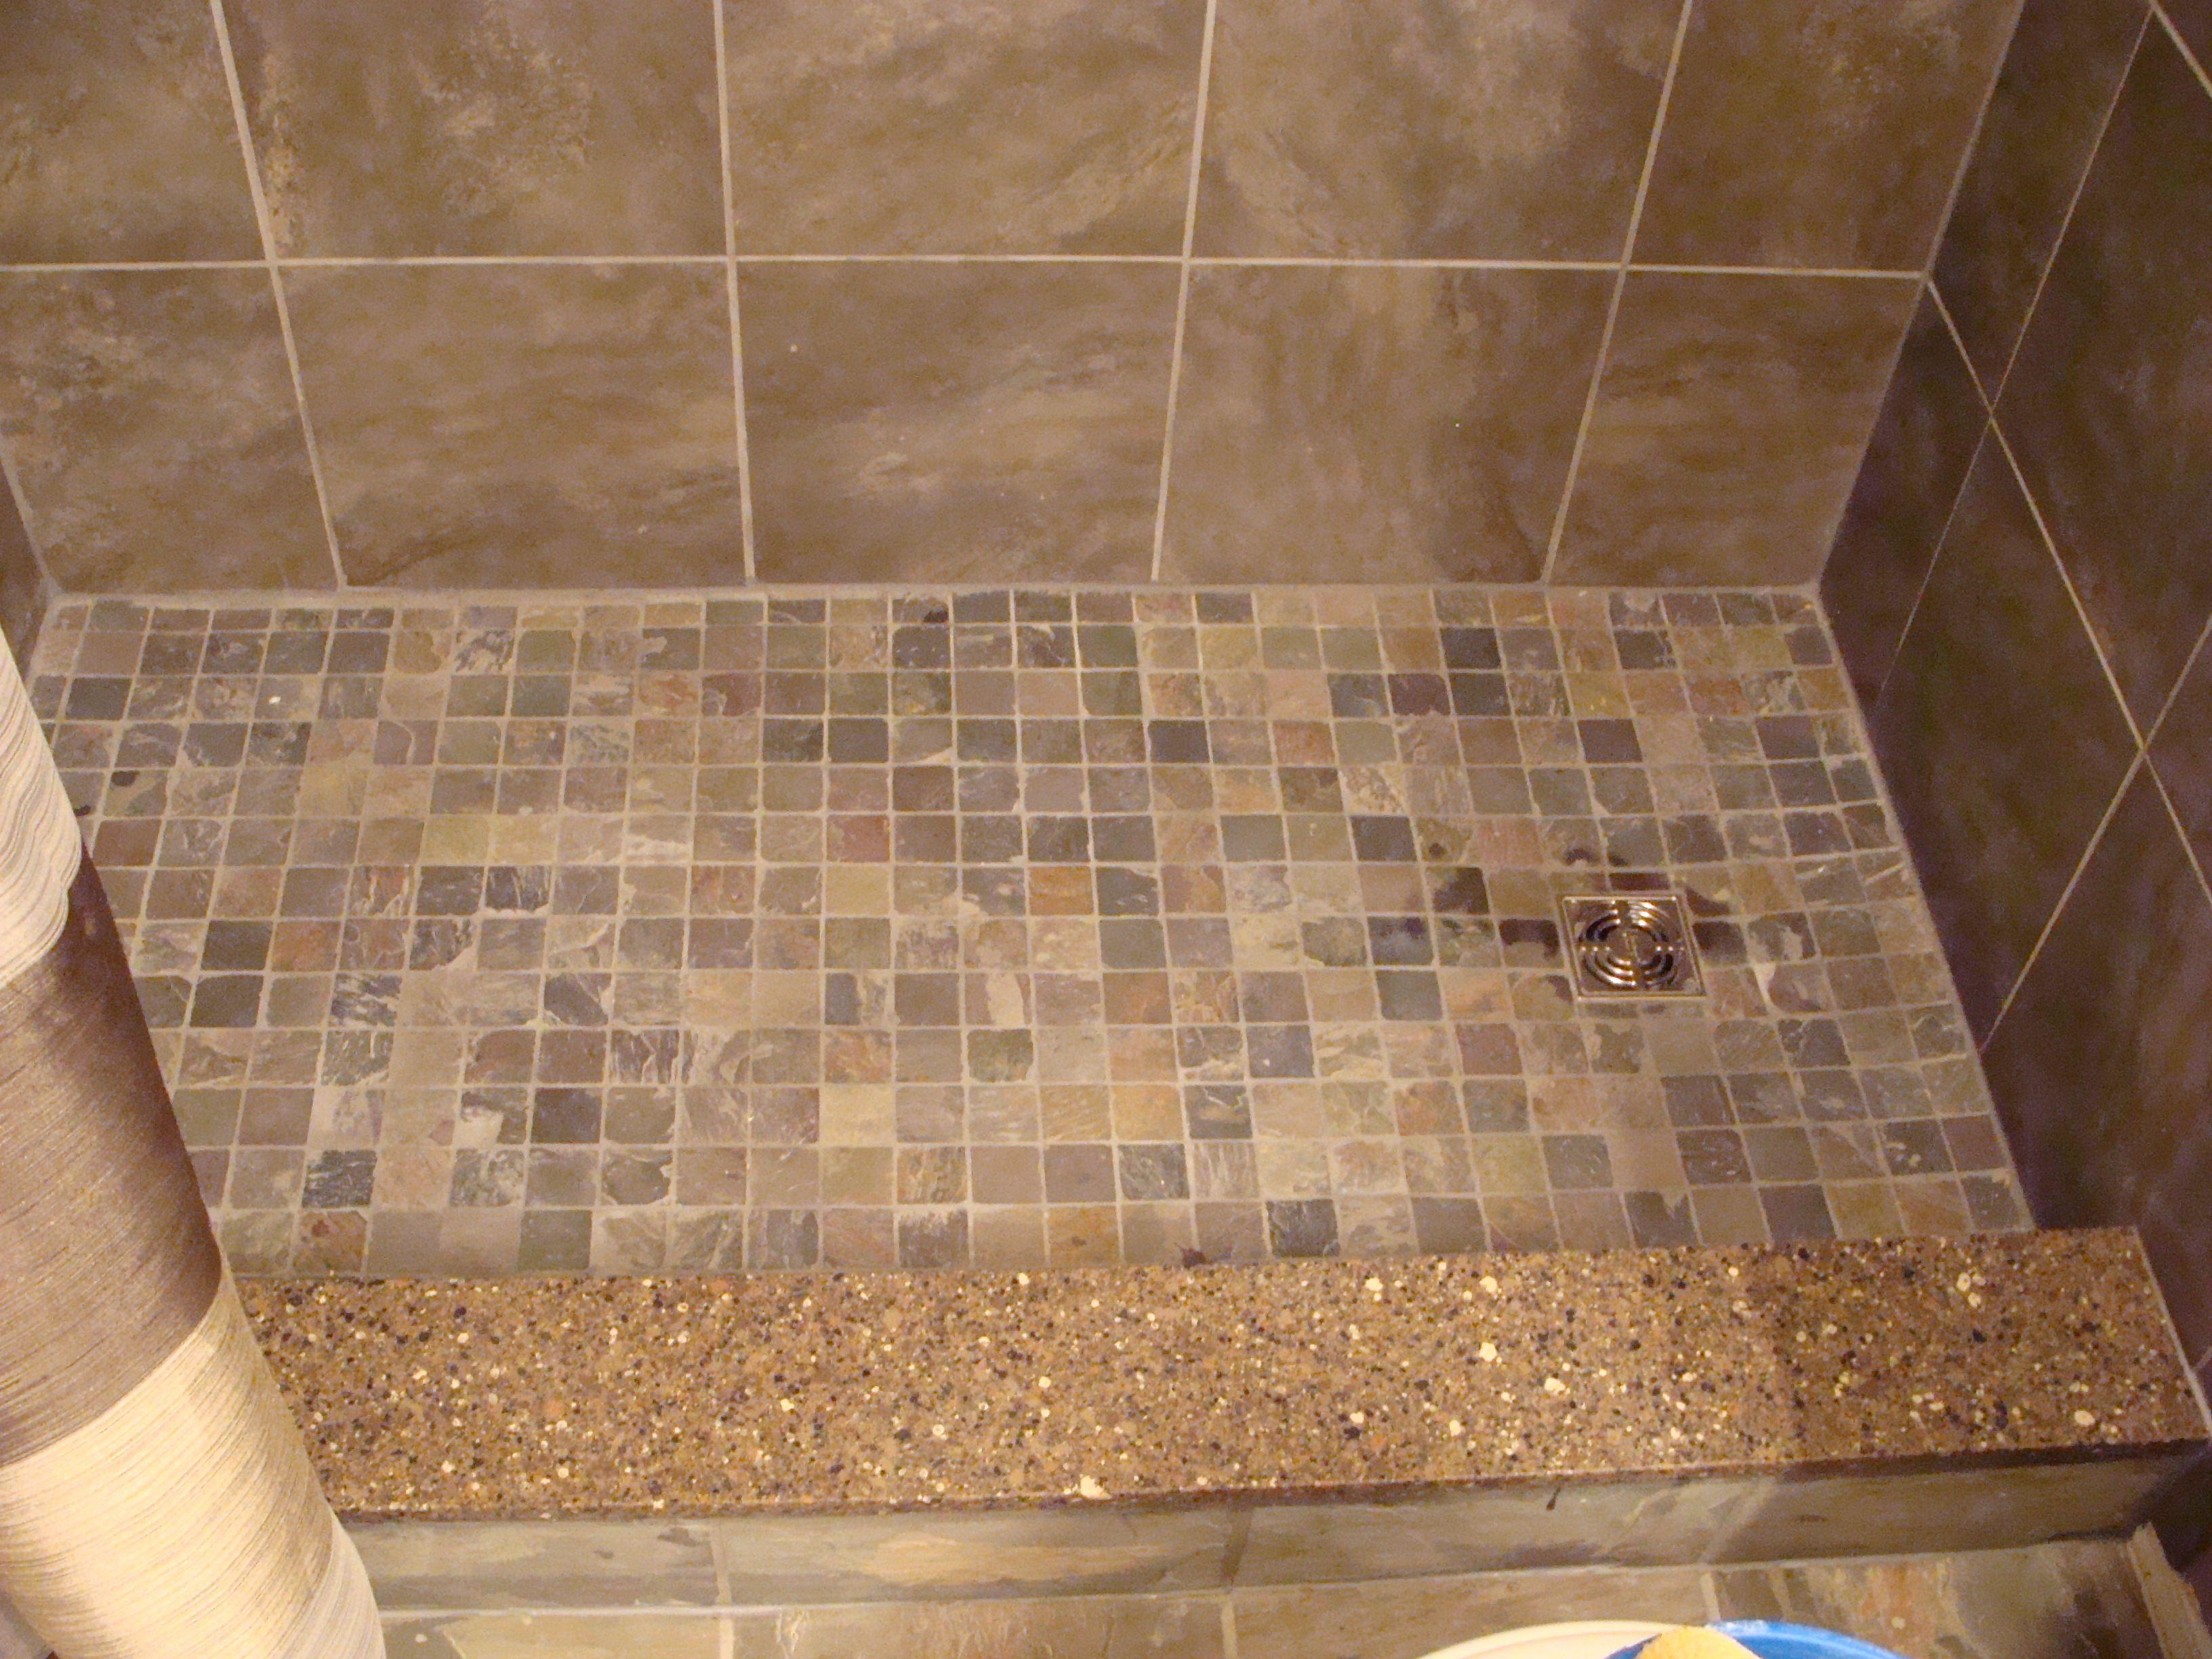 Slate Mosaic Tiles On Shower Floor Quartz Shower Curb Bathtub To